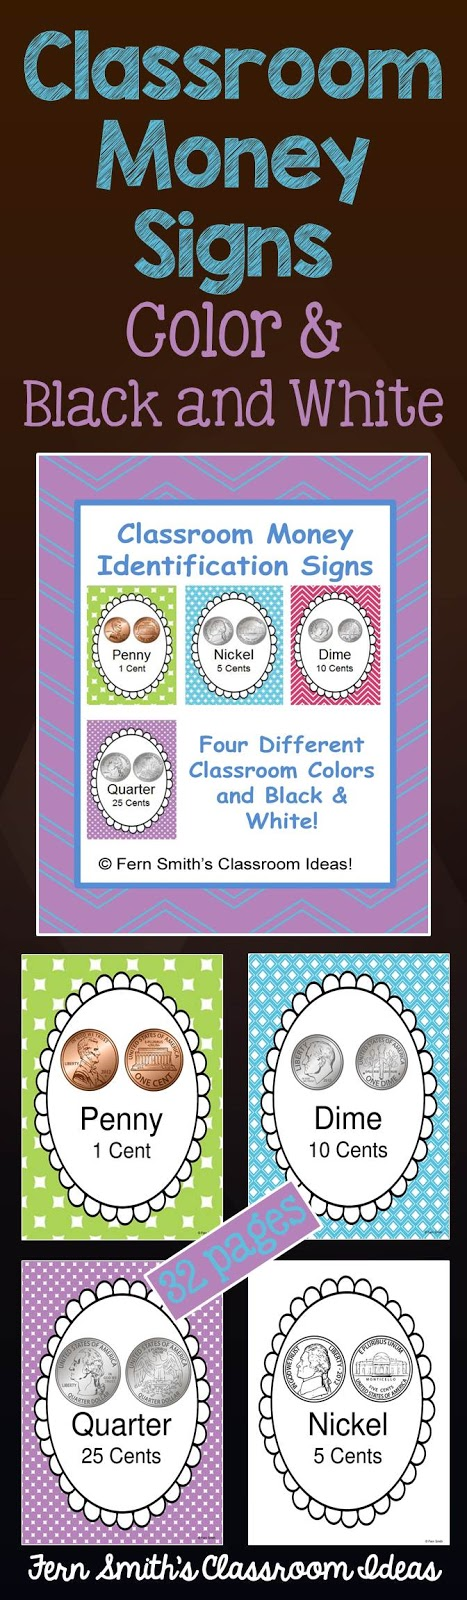 Fern Smith's Classroom Ideas Classroom Money Signs and Books at TeachersPayTeachers